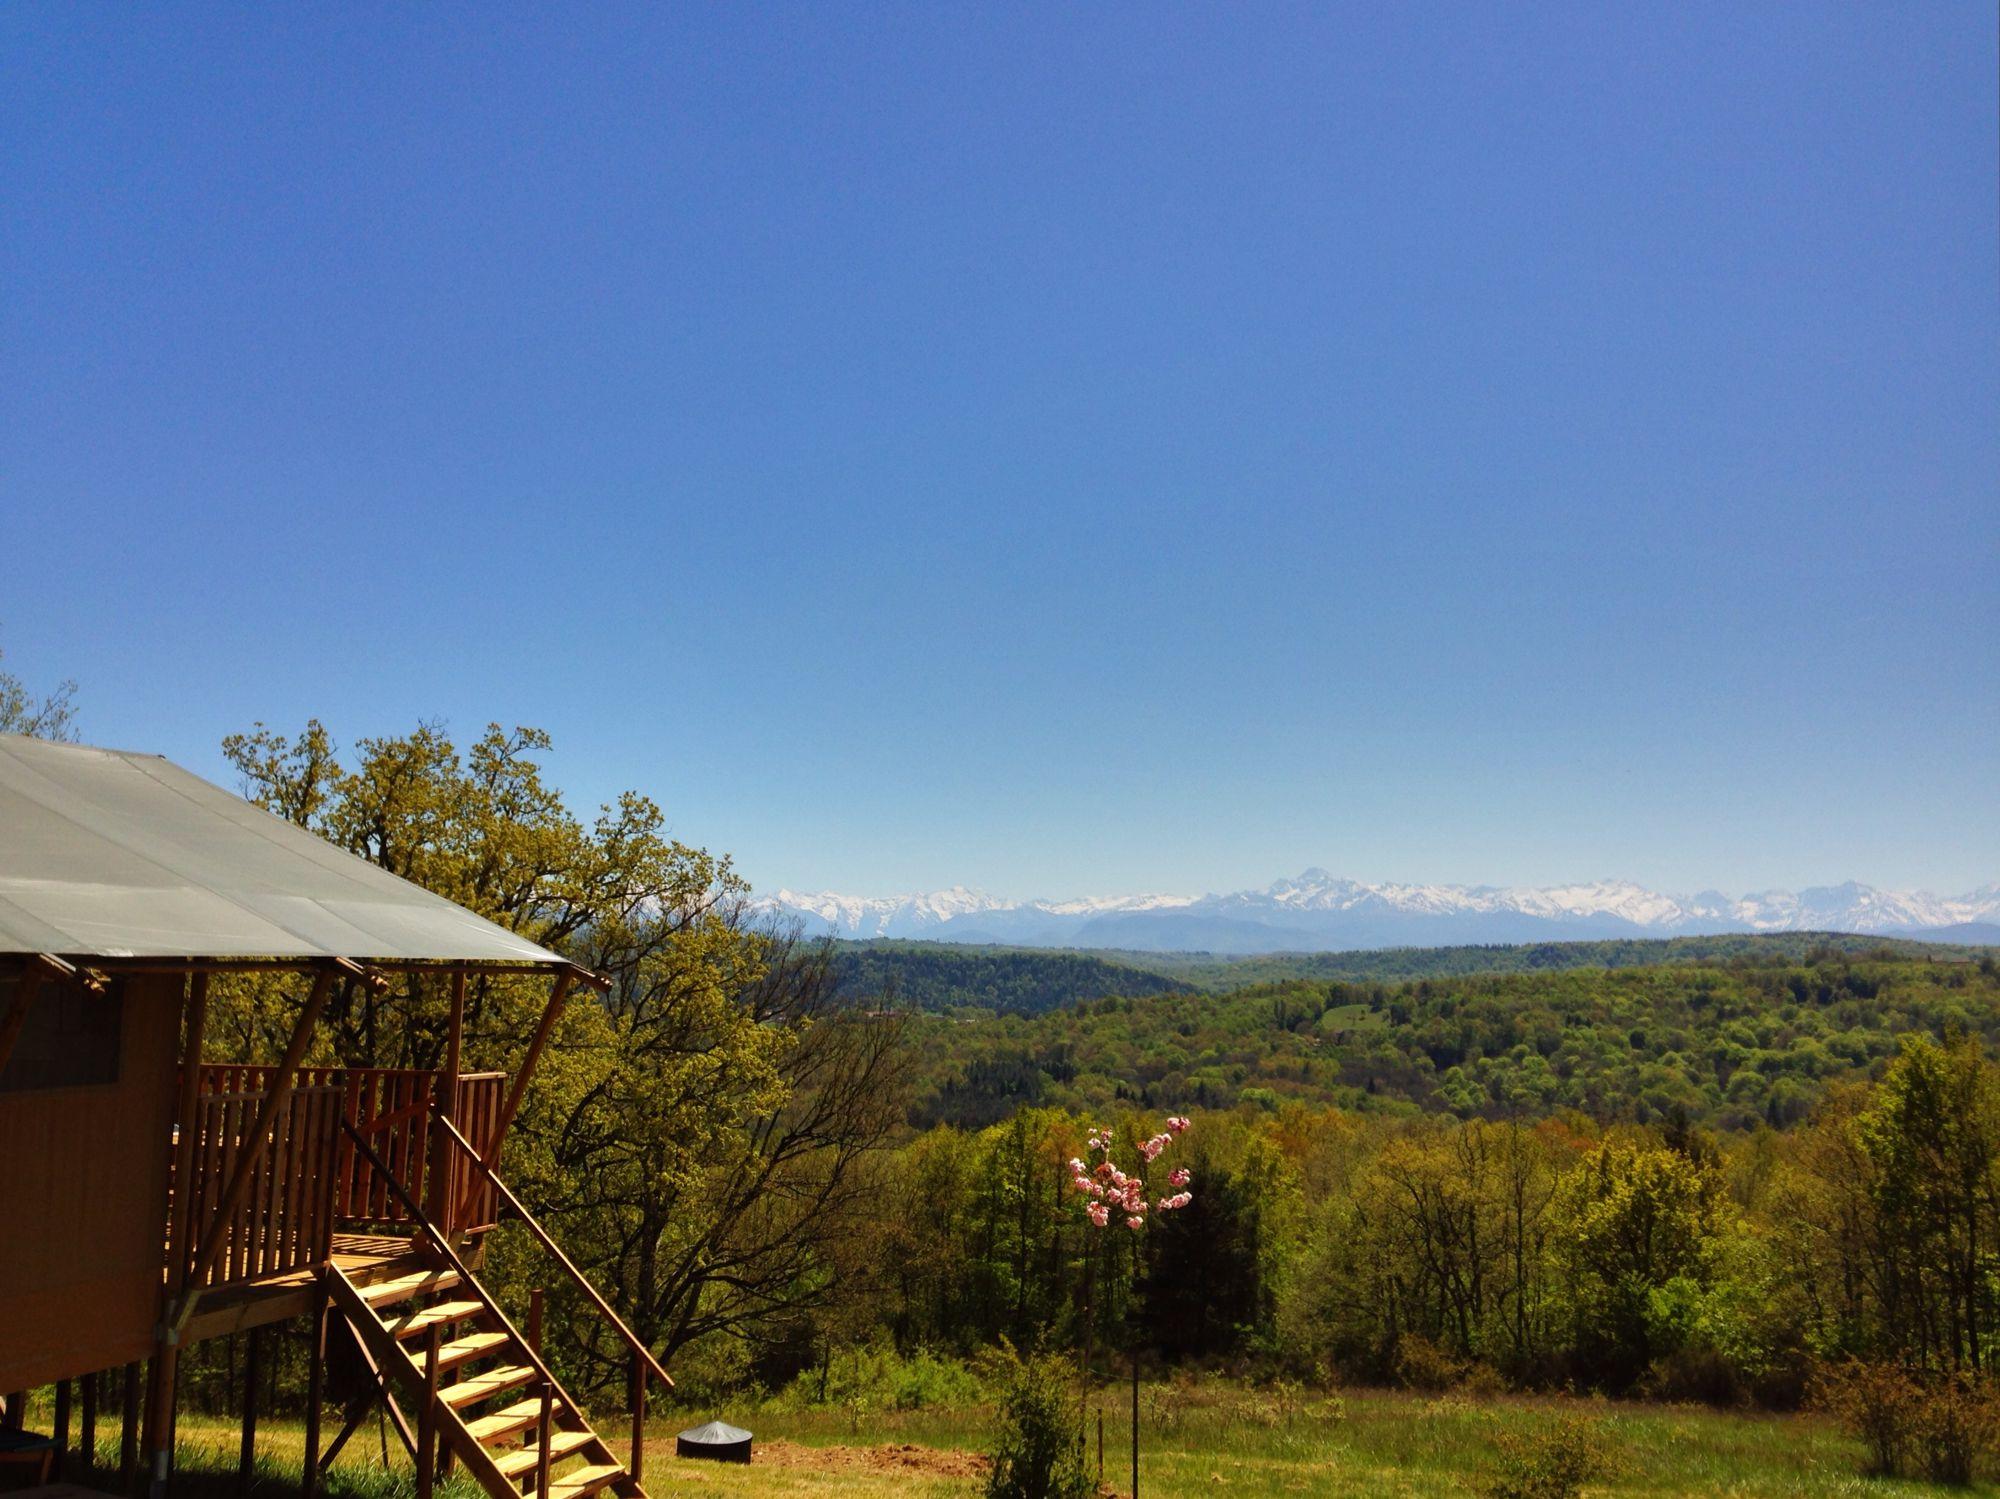 Campsites in Haute-Garonne - campsites europe france midi-pyrenees haute-garonne at Cool Camping